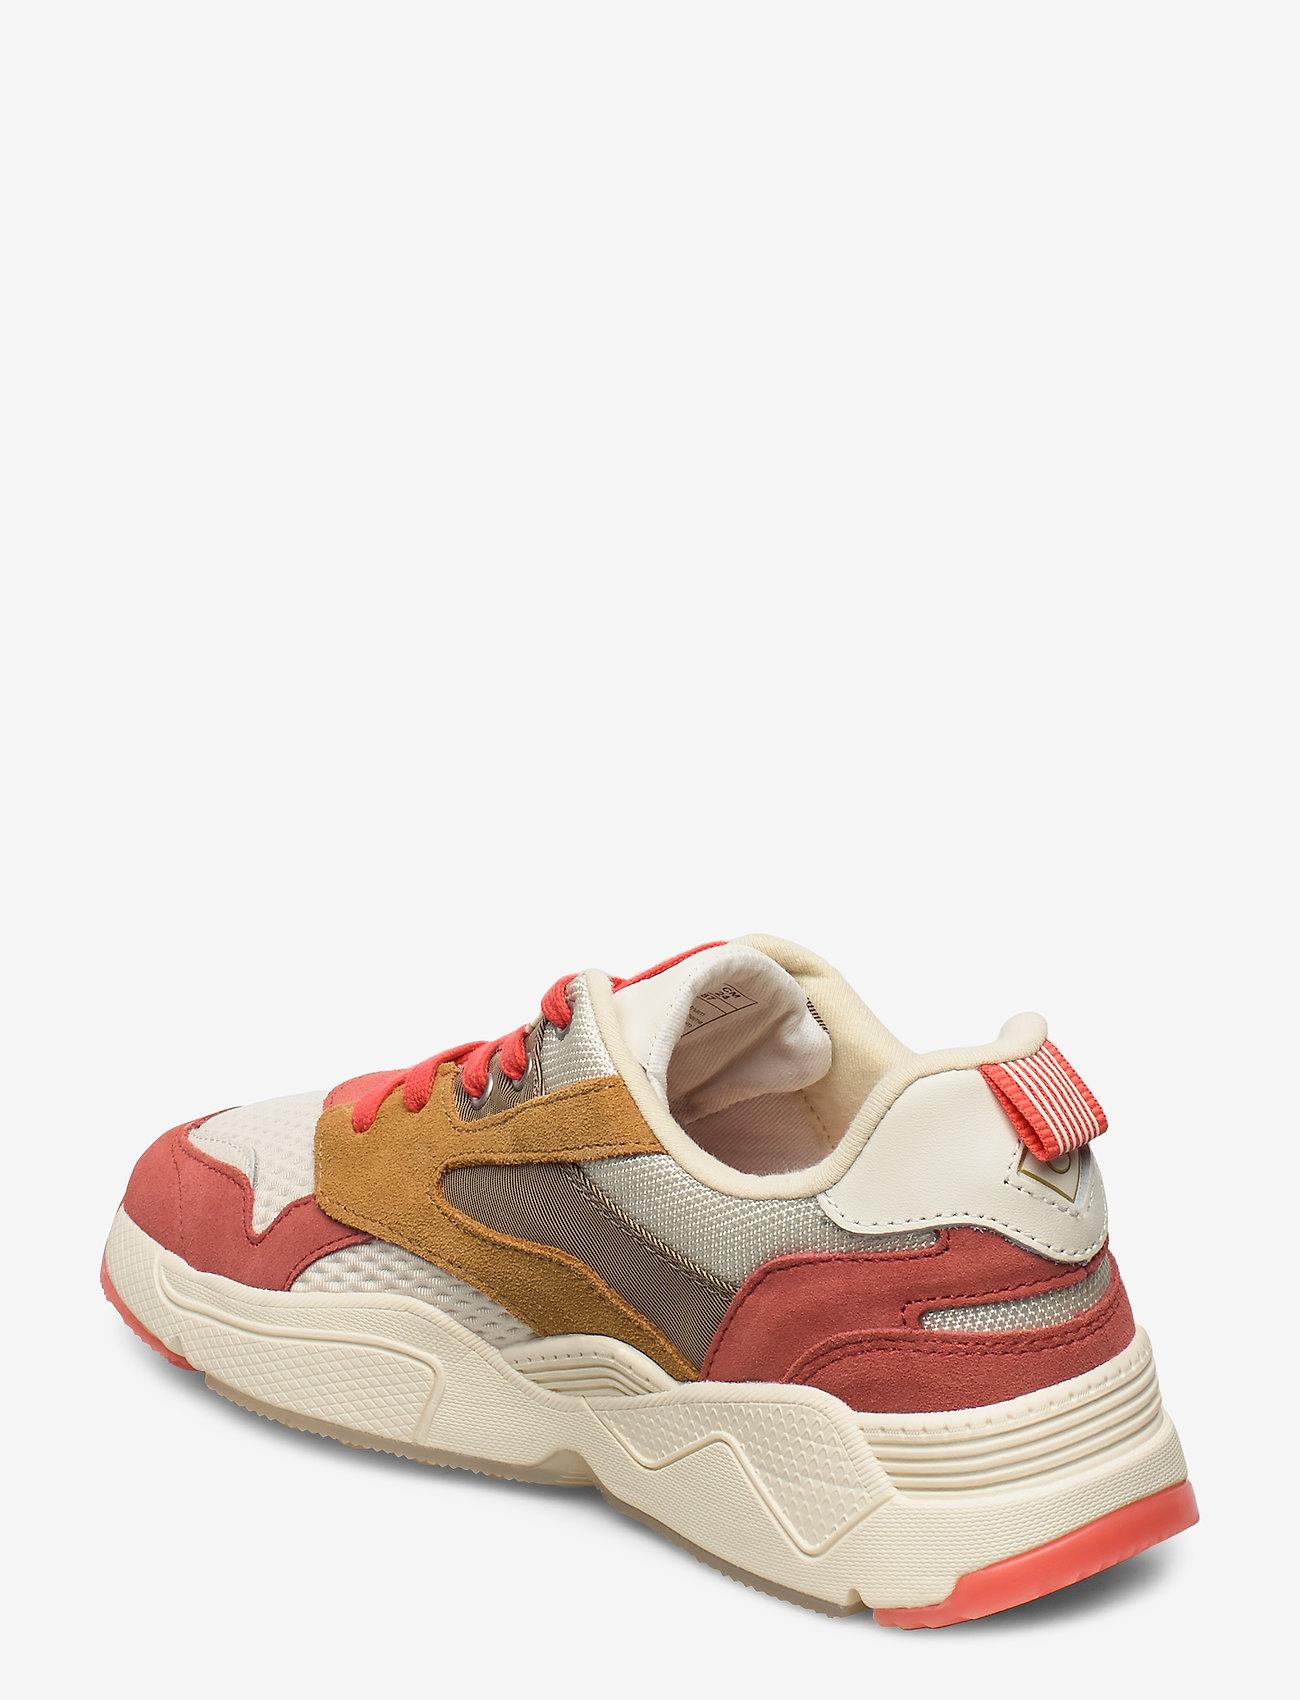 Nicewill Sneaker (Br.coral/fudge Caramel) (714.35 kr) - GANT